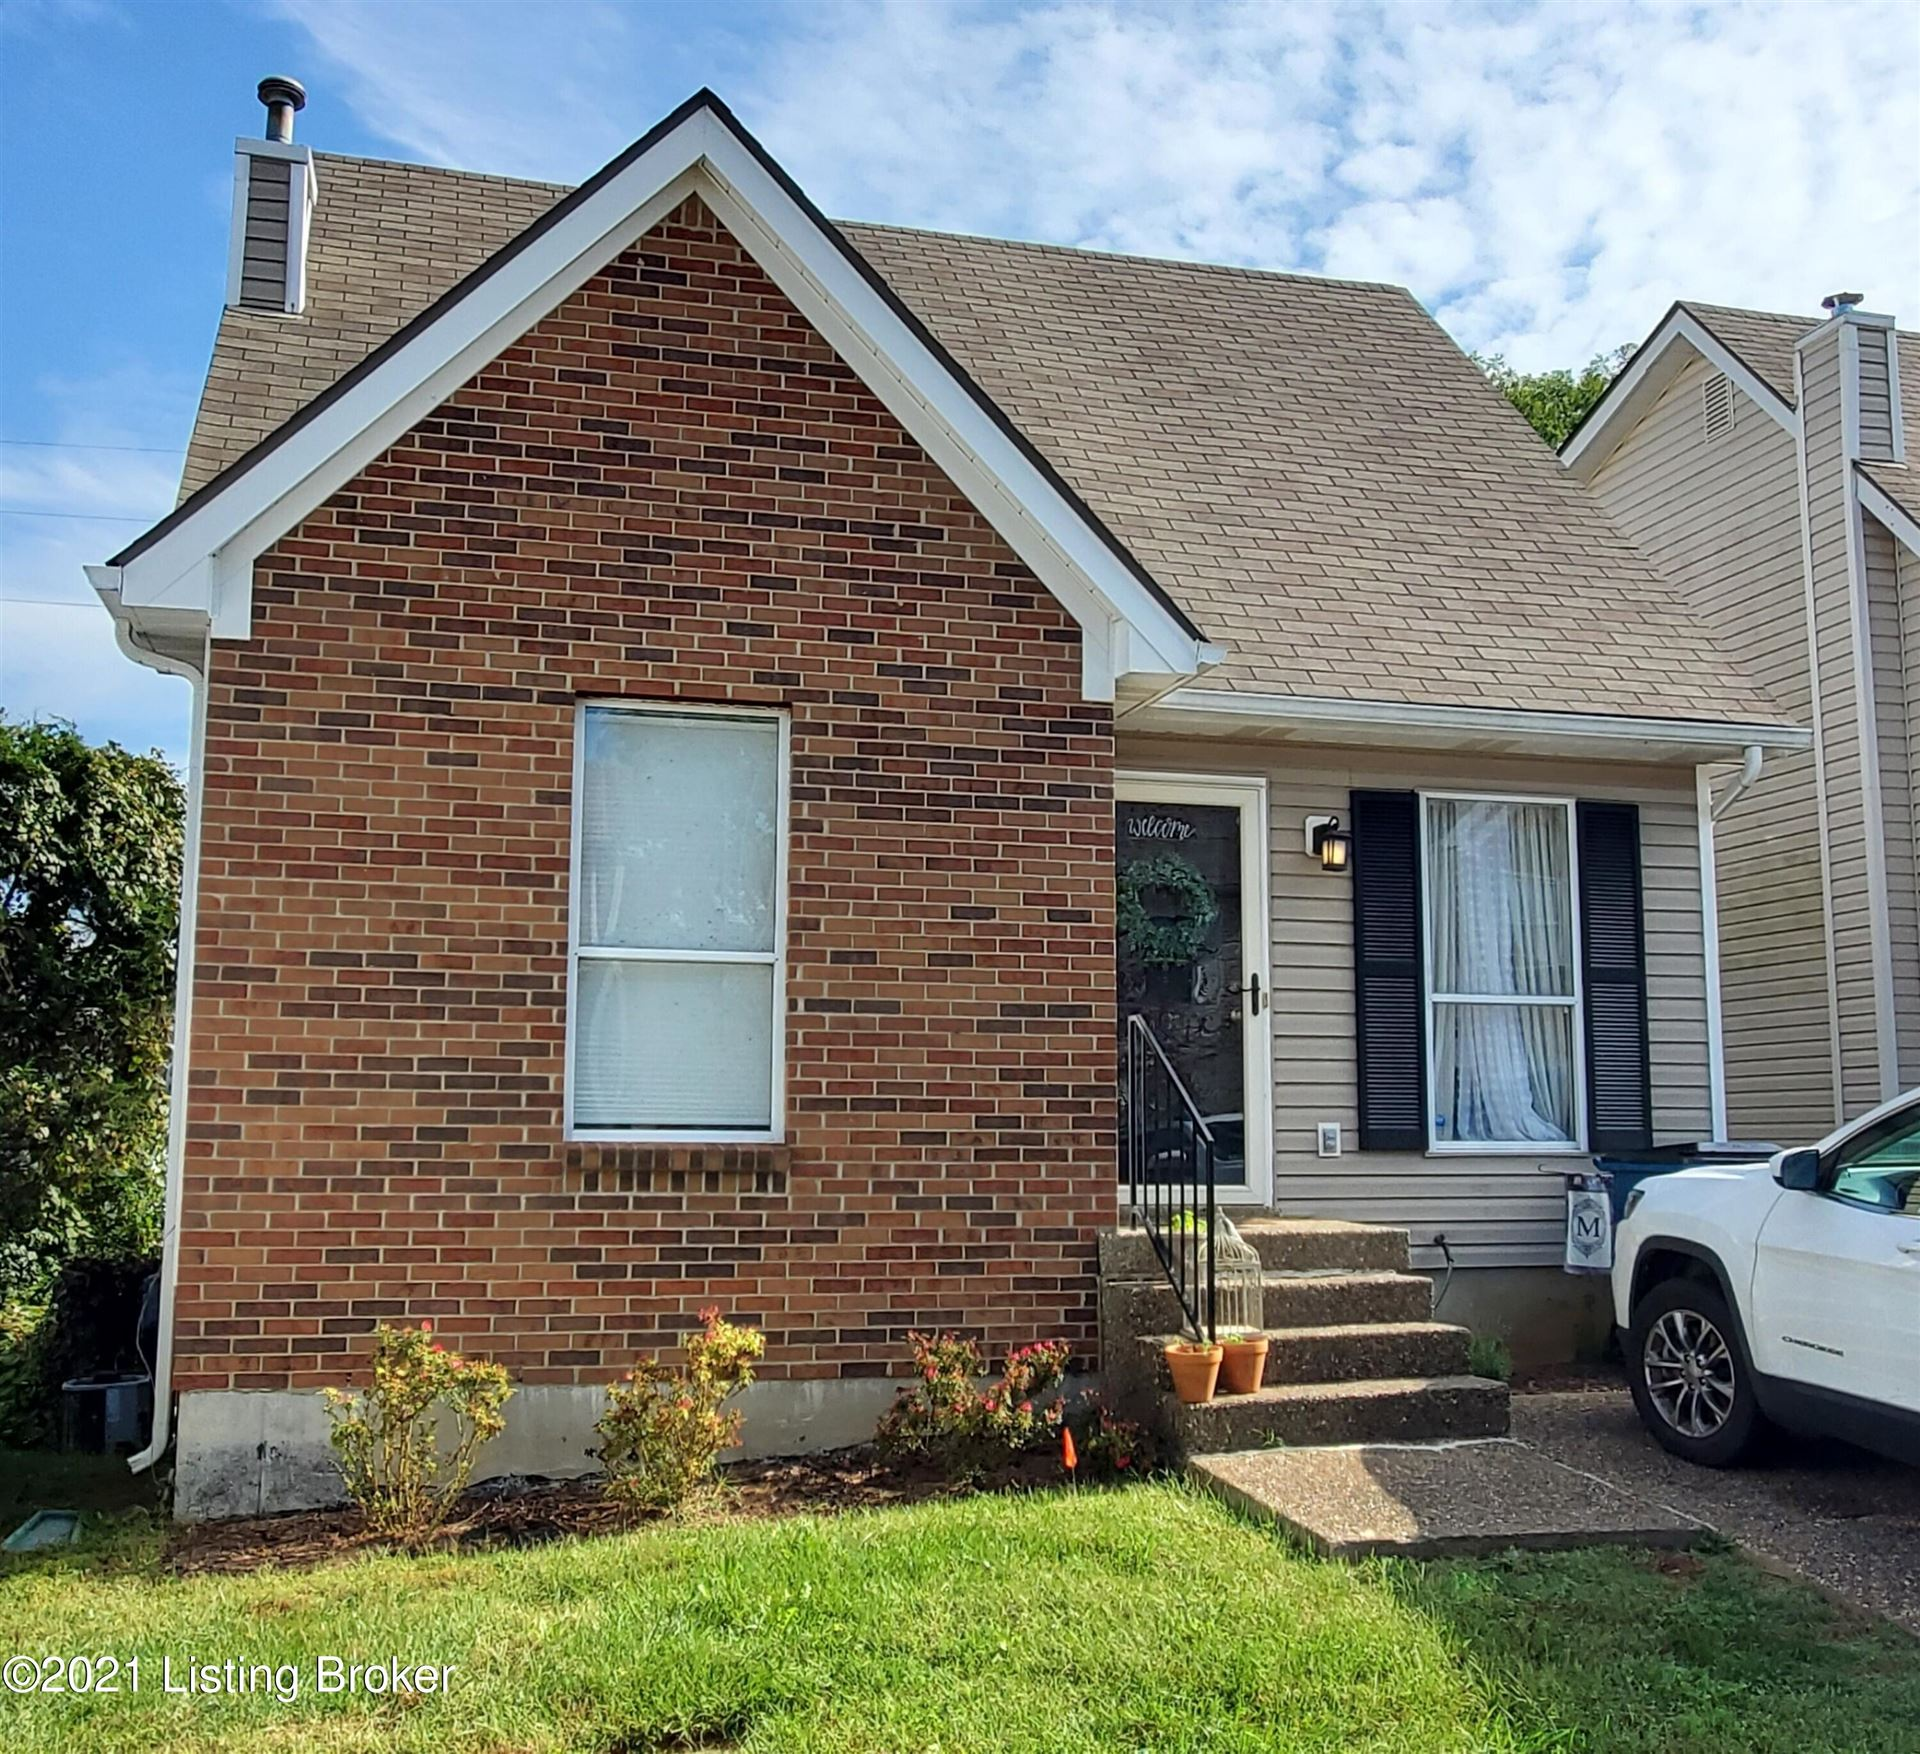 Photo for 12511 Kiawah Ct, Louisville, KY 40245 (MLS # 1598590)